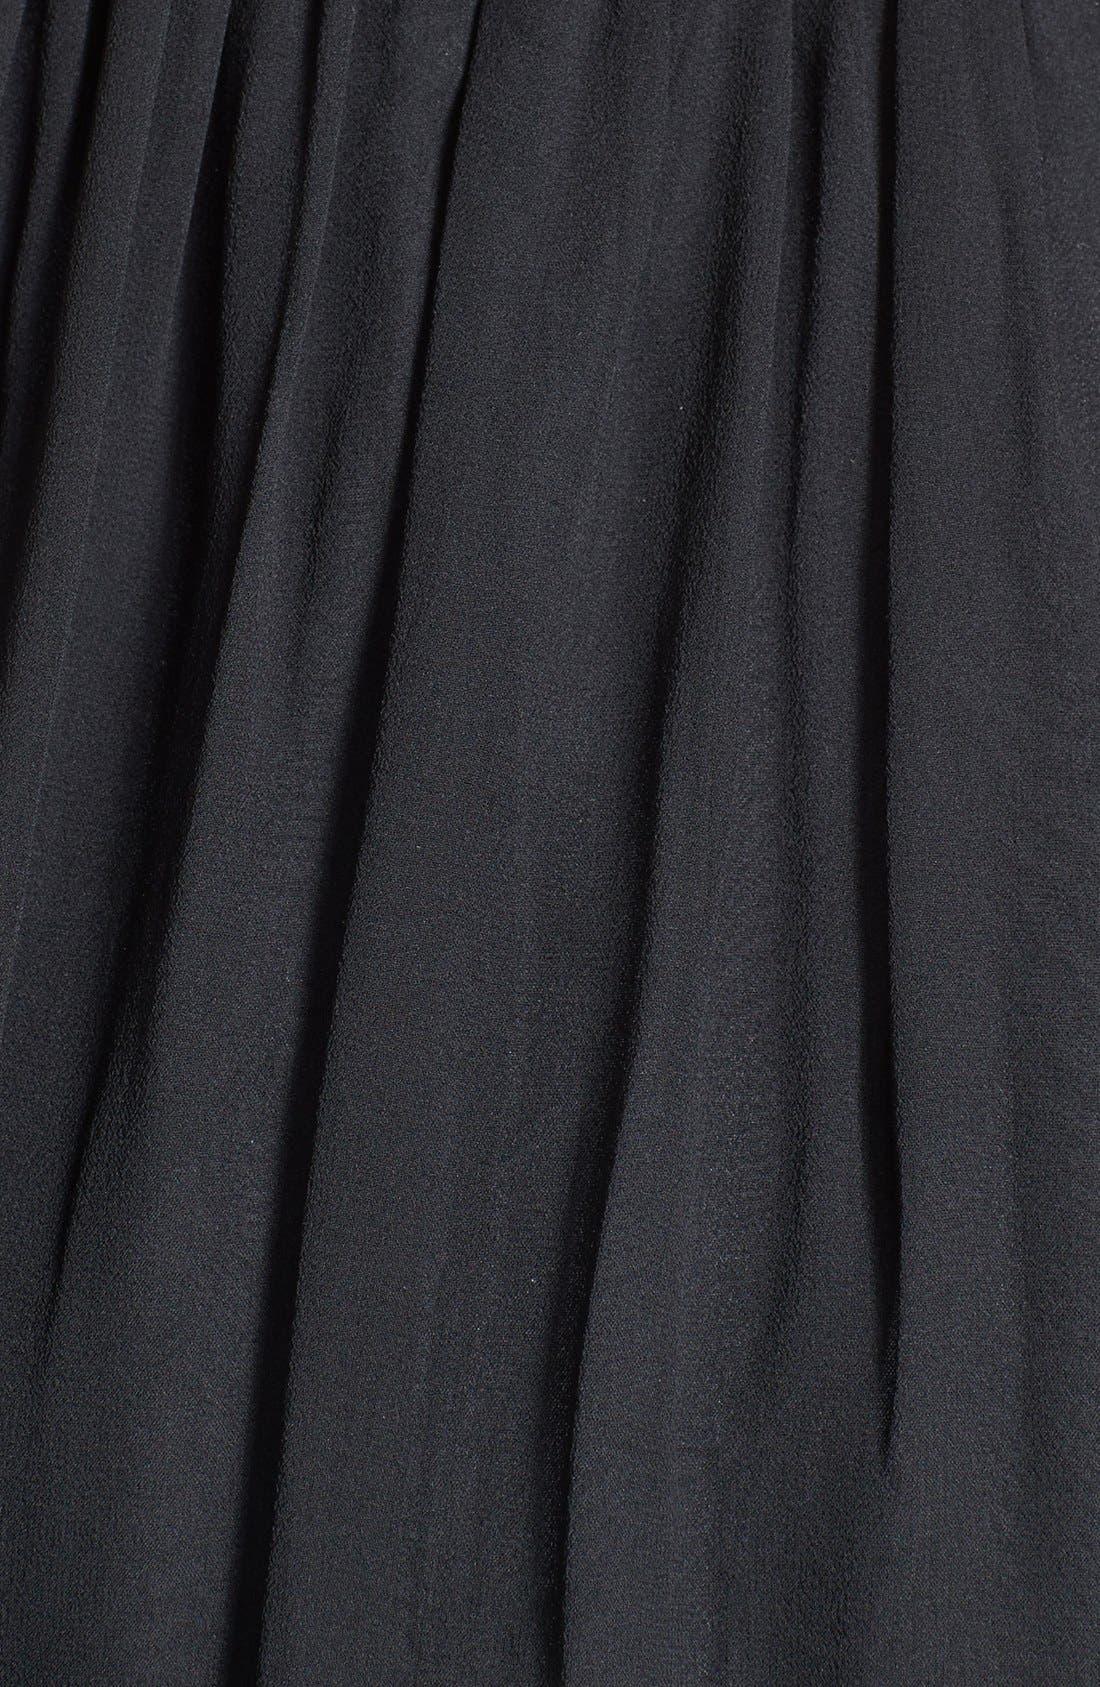 'Morgan' Strapless Silk Chiffon Dress,                             Alternate thumbnail 101, color,